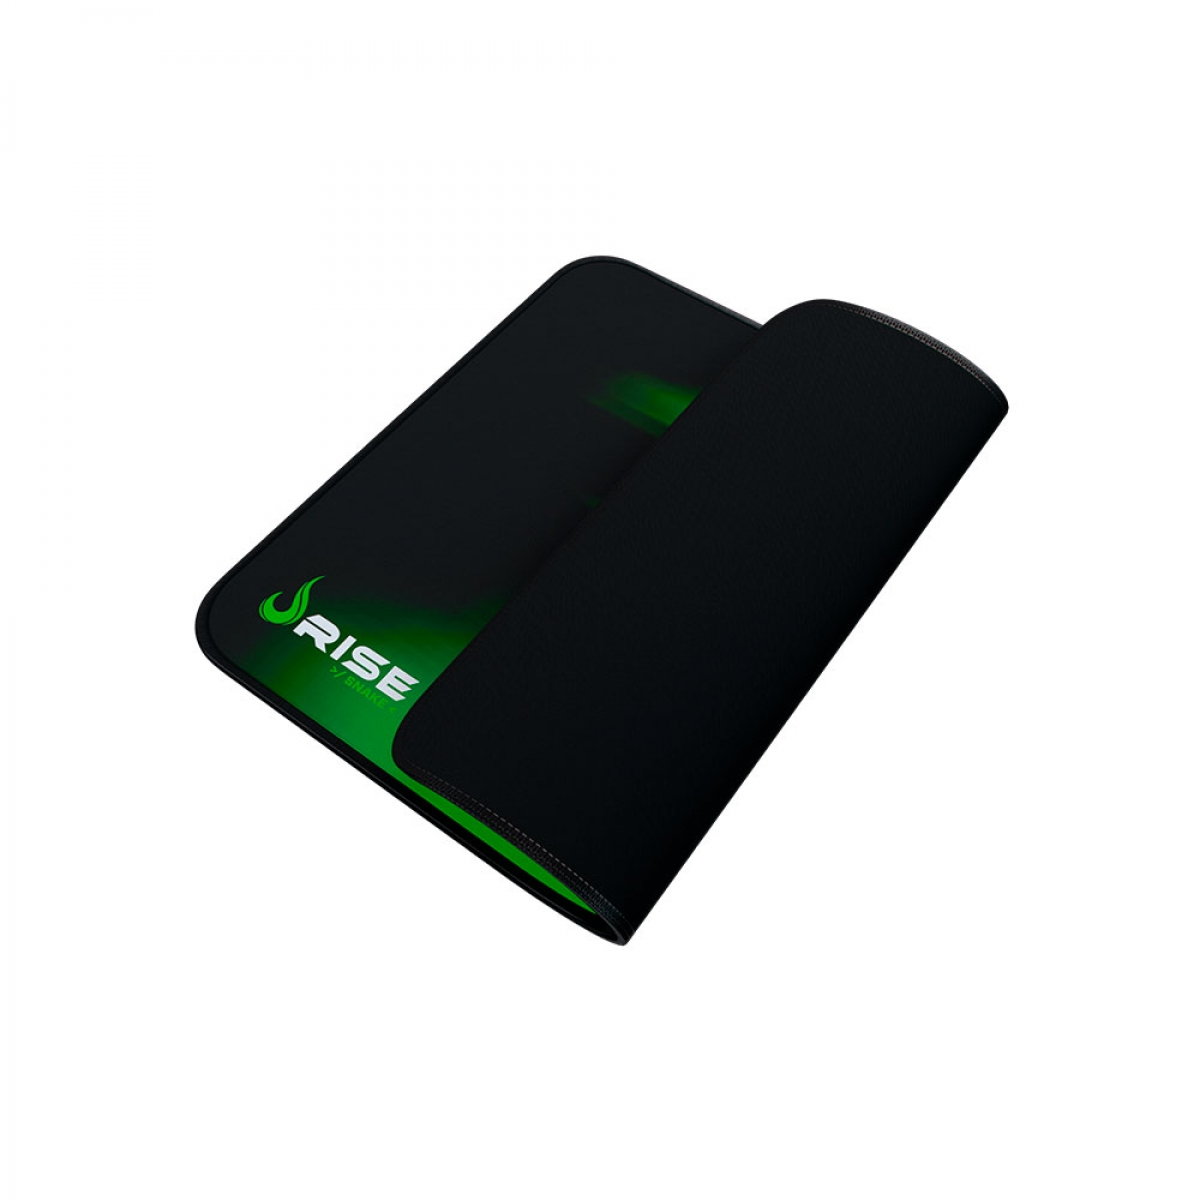 Mousepad Gamer Rise Mode SNAKE, MÉDIO, BORDA COSTURADA, RG-MP-04-SE